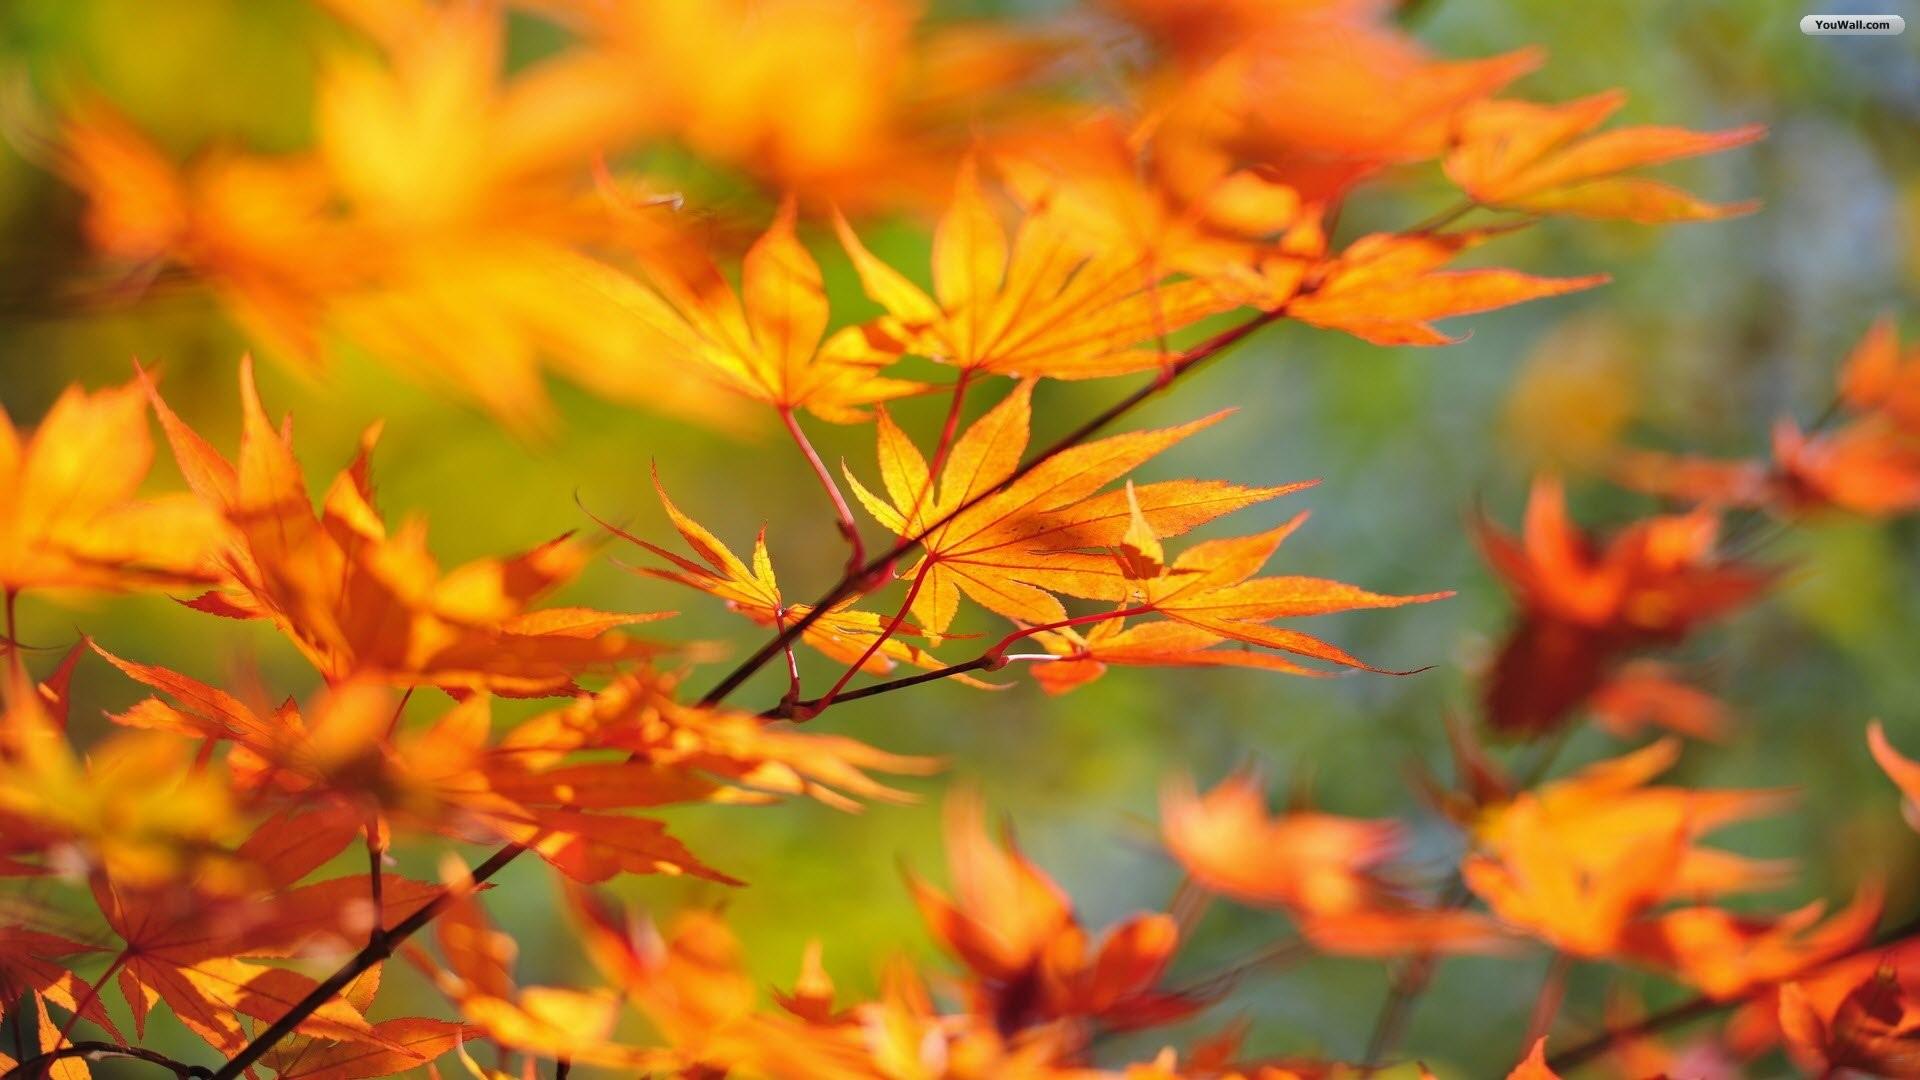 Autumn desktop wallpaper download free stunning full hd - Free 1920x1080 desktop wallpaper ...